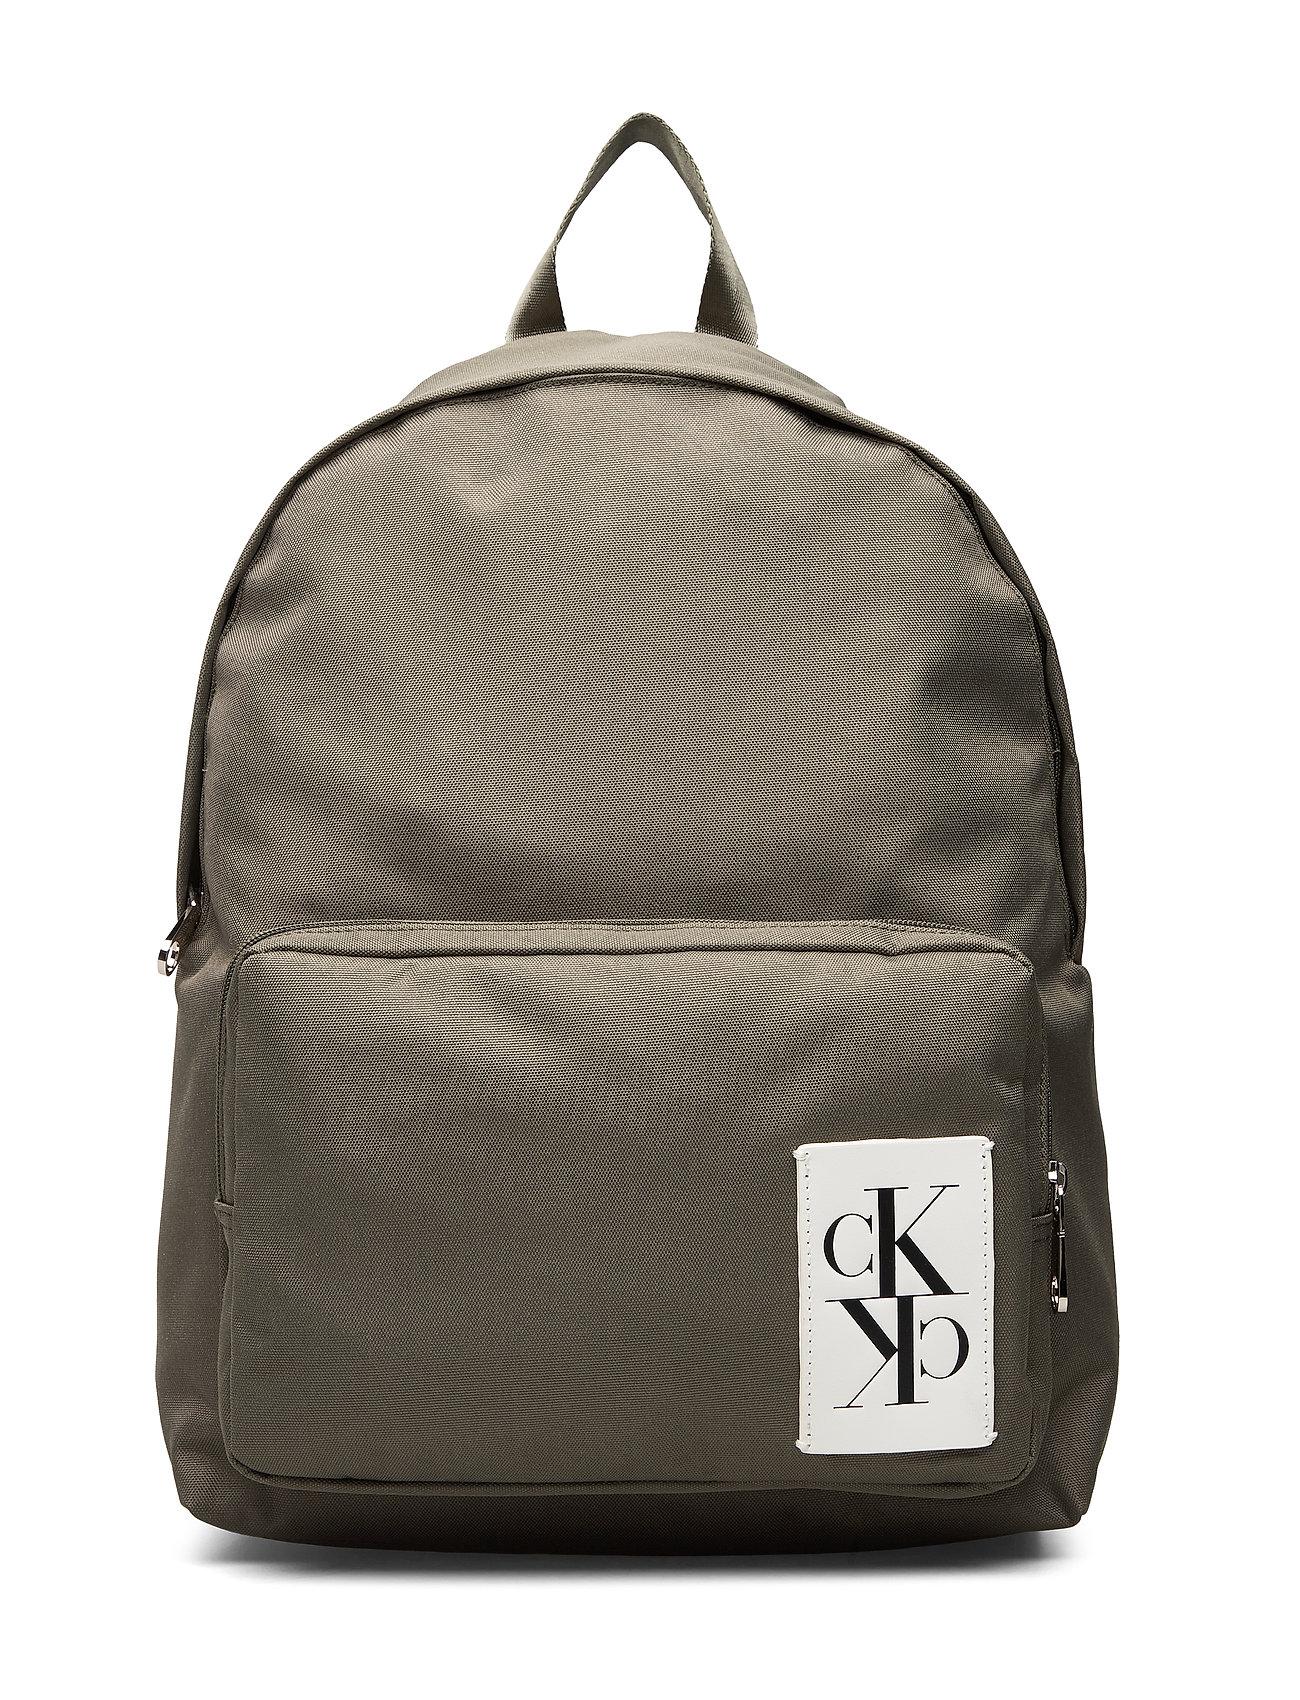 Calvin Klein SPORT ESSENTIALS CP BACKPACK 45 - DUSTY OLIVE